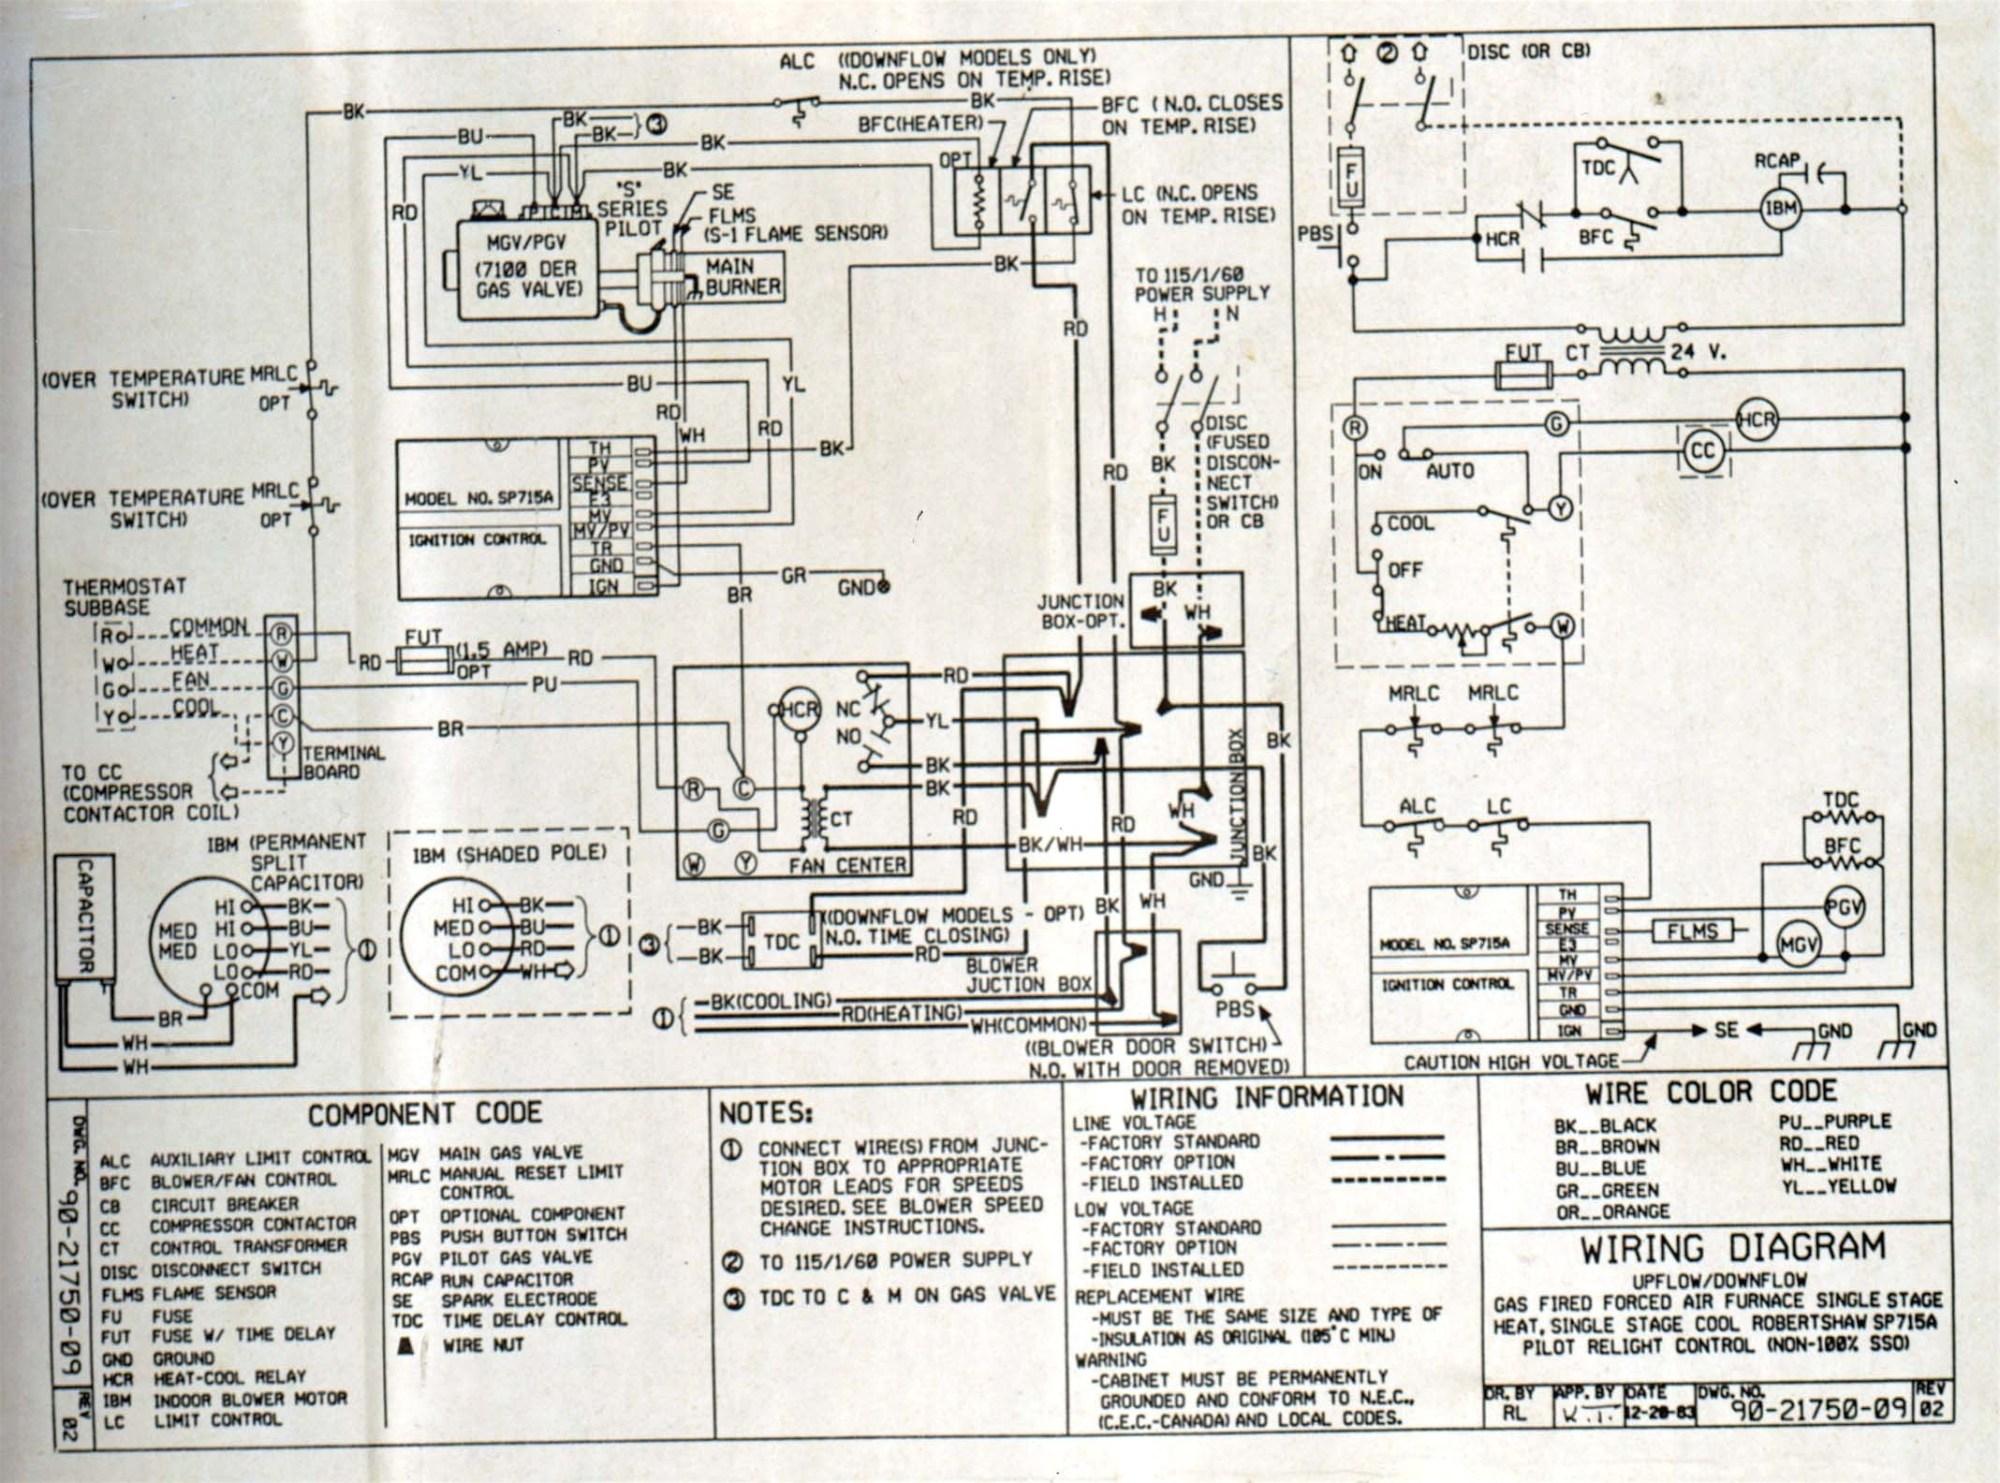 hight resolution of furnace transformer wiring diagram collection wiring diagram payne ac unit inspirationa payne electric furnace wiring download wiring diagram